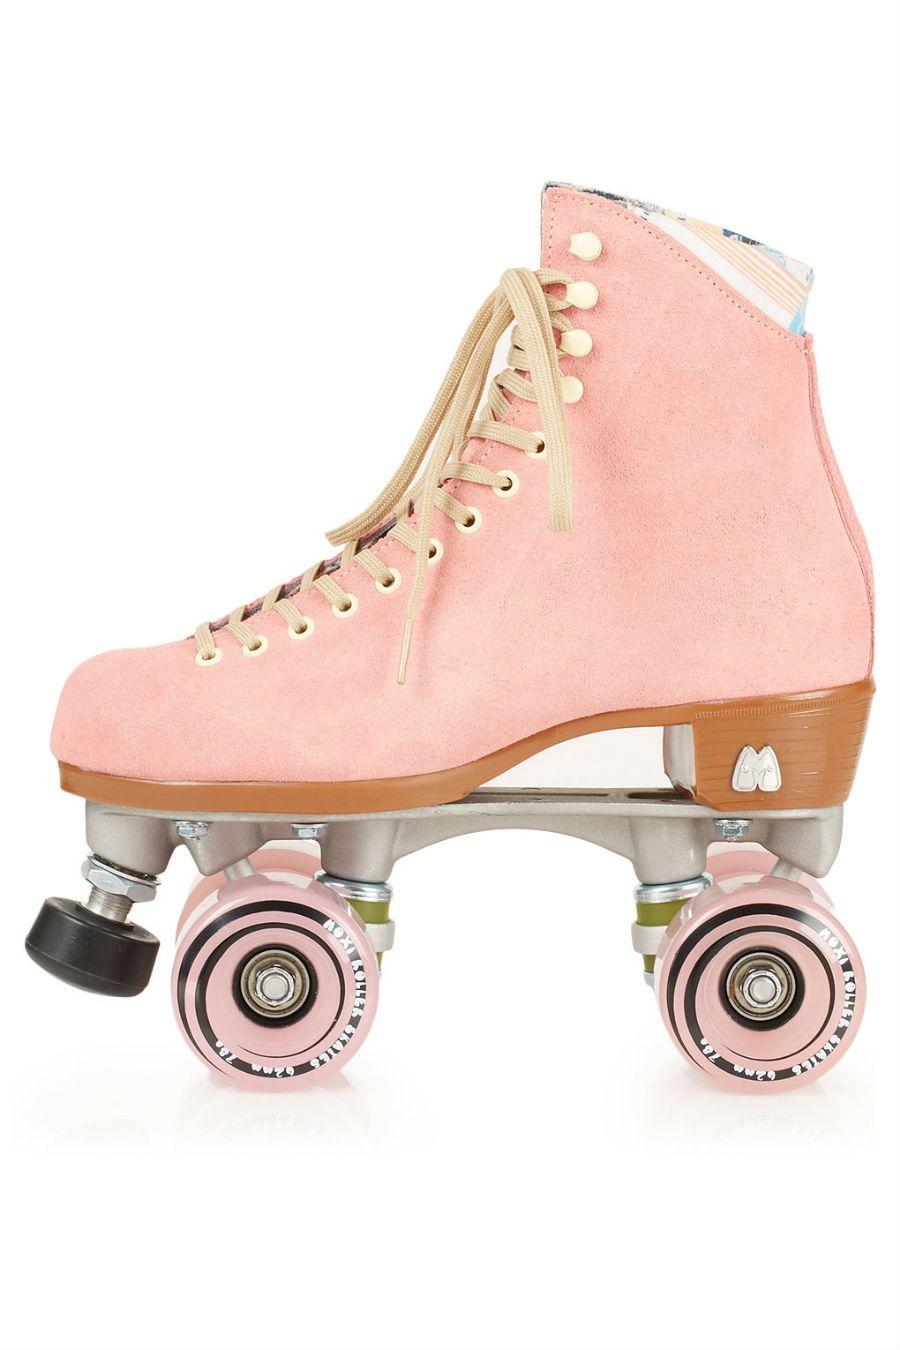 Roller skating kendall - Moxi Roller Skates Zoom In To Topshop